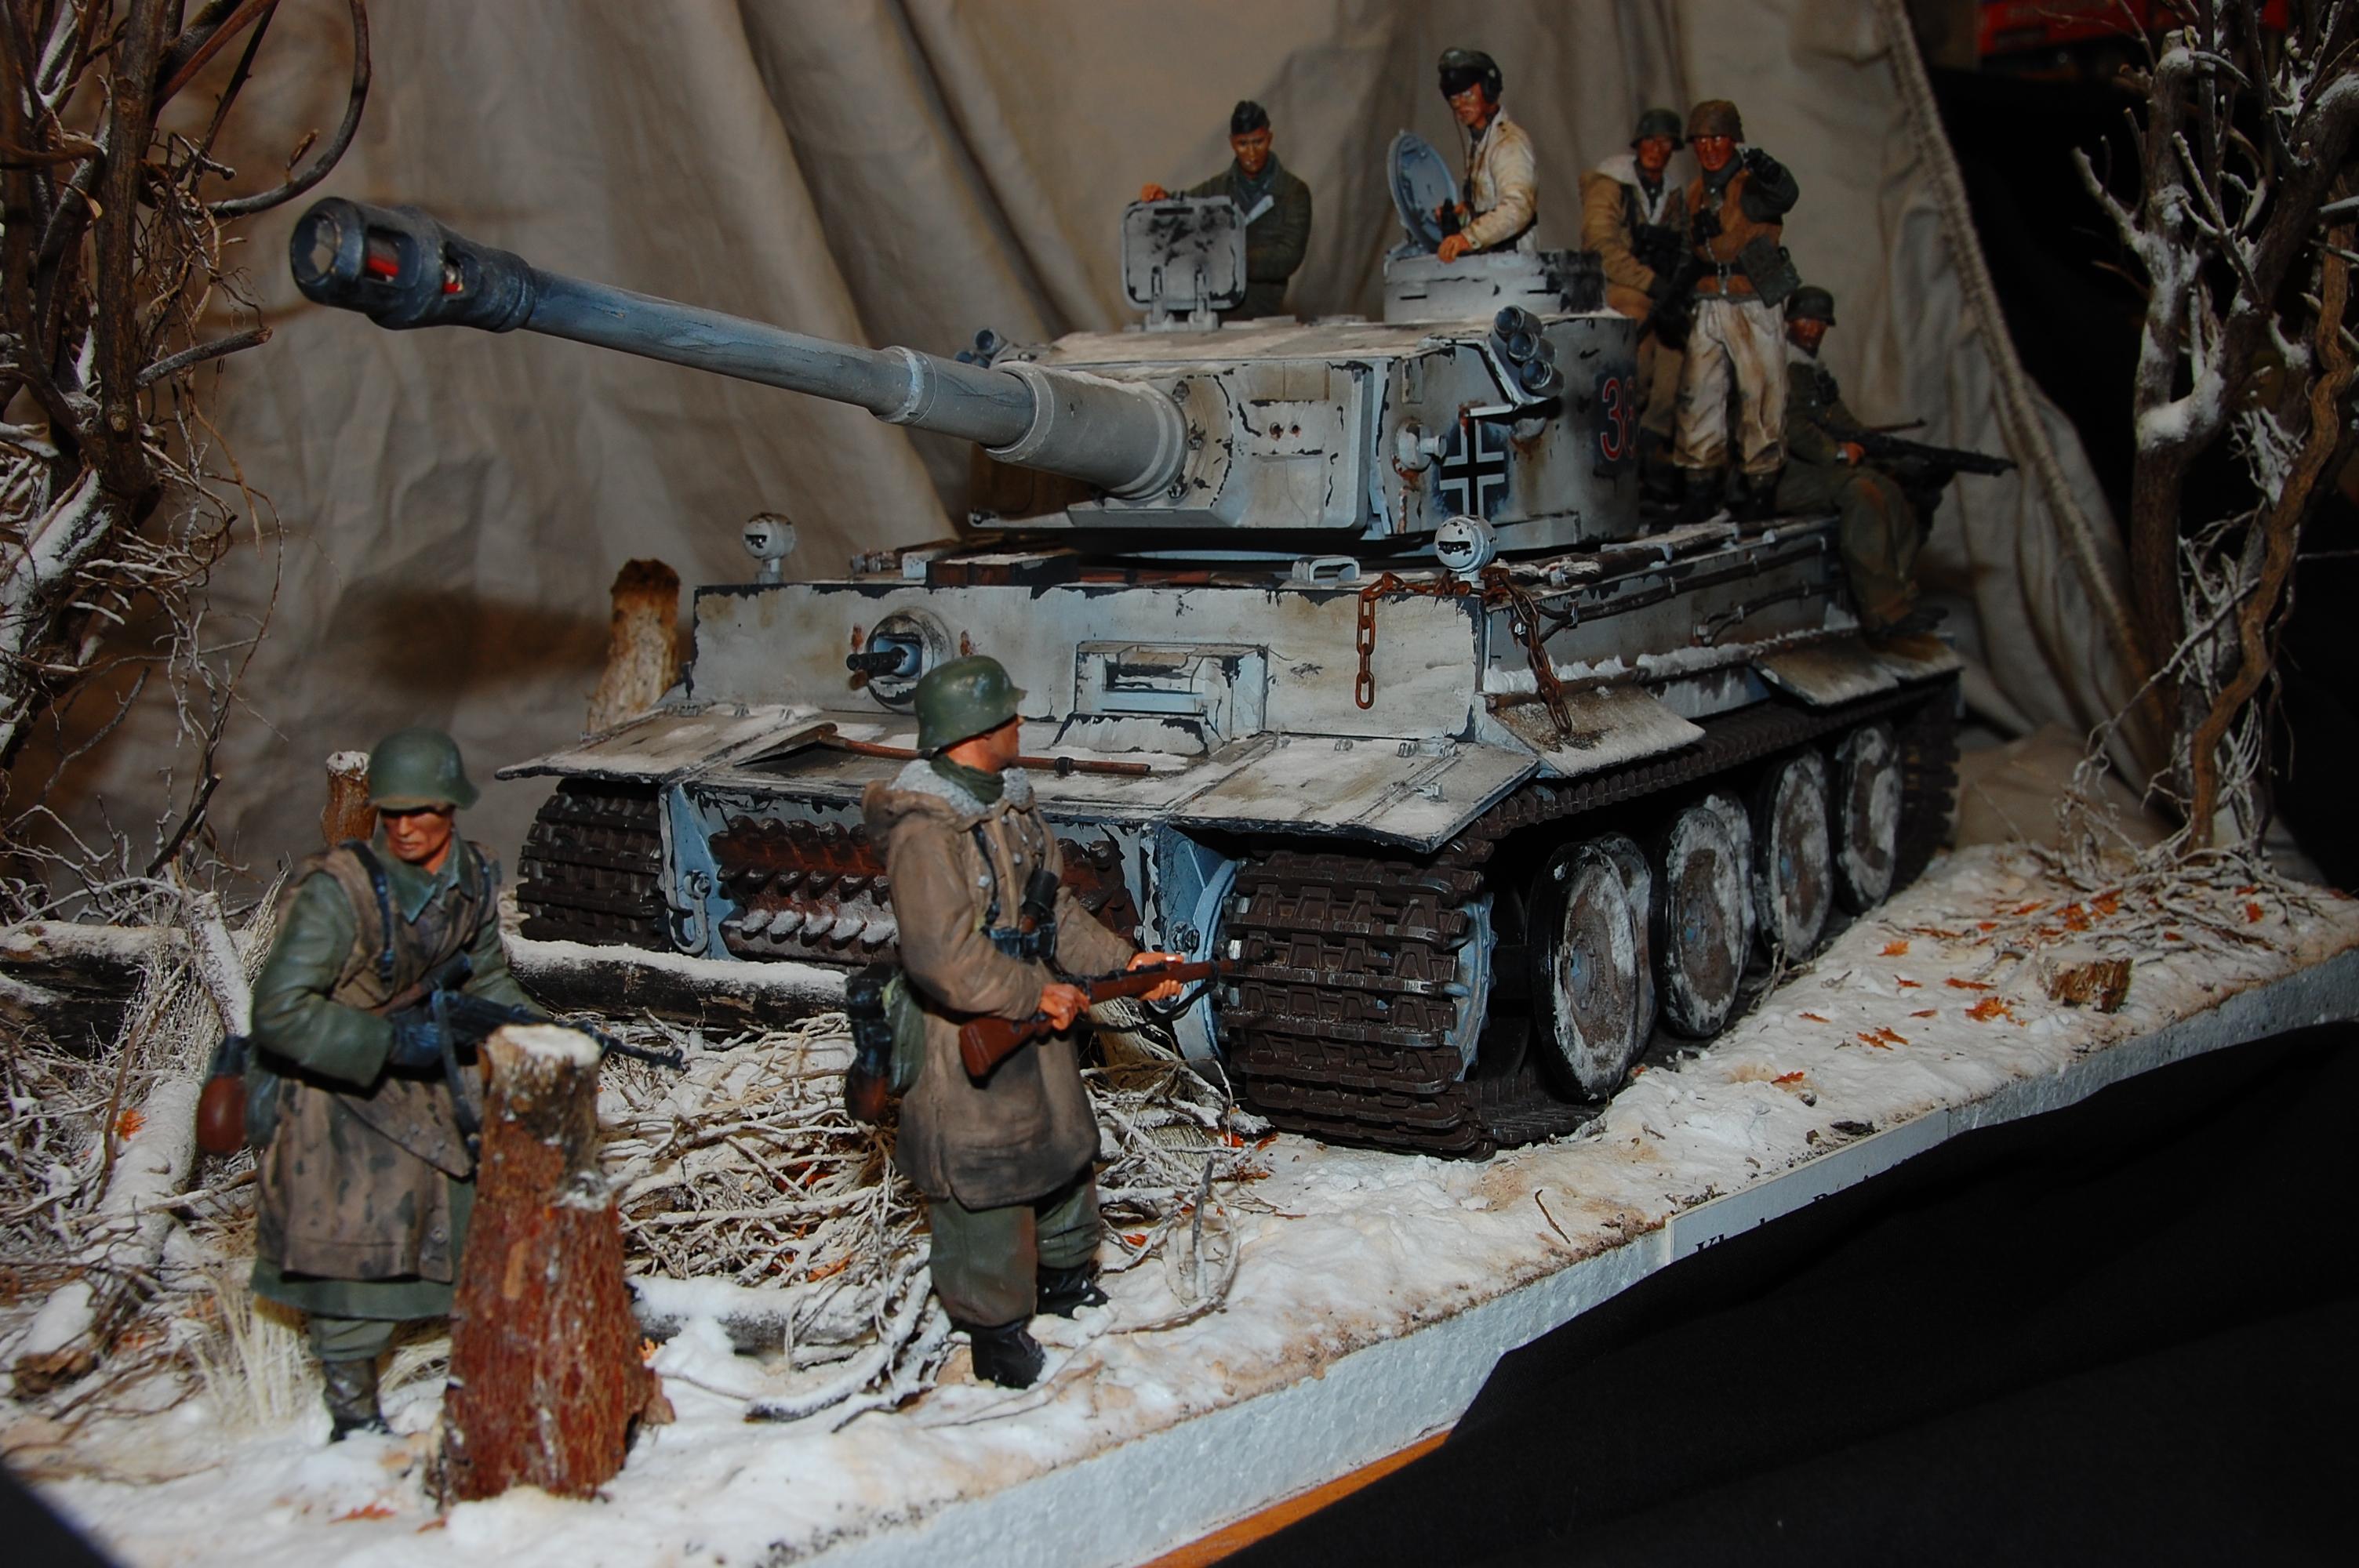 1/16 Tank Diorama Finished w/ Autmn Leaves - RCU Forums